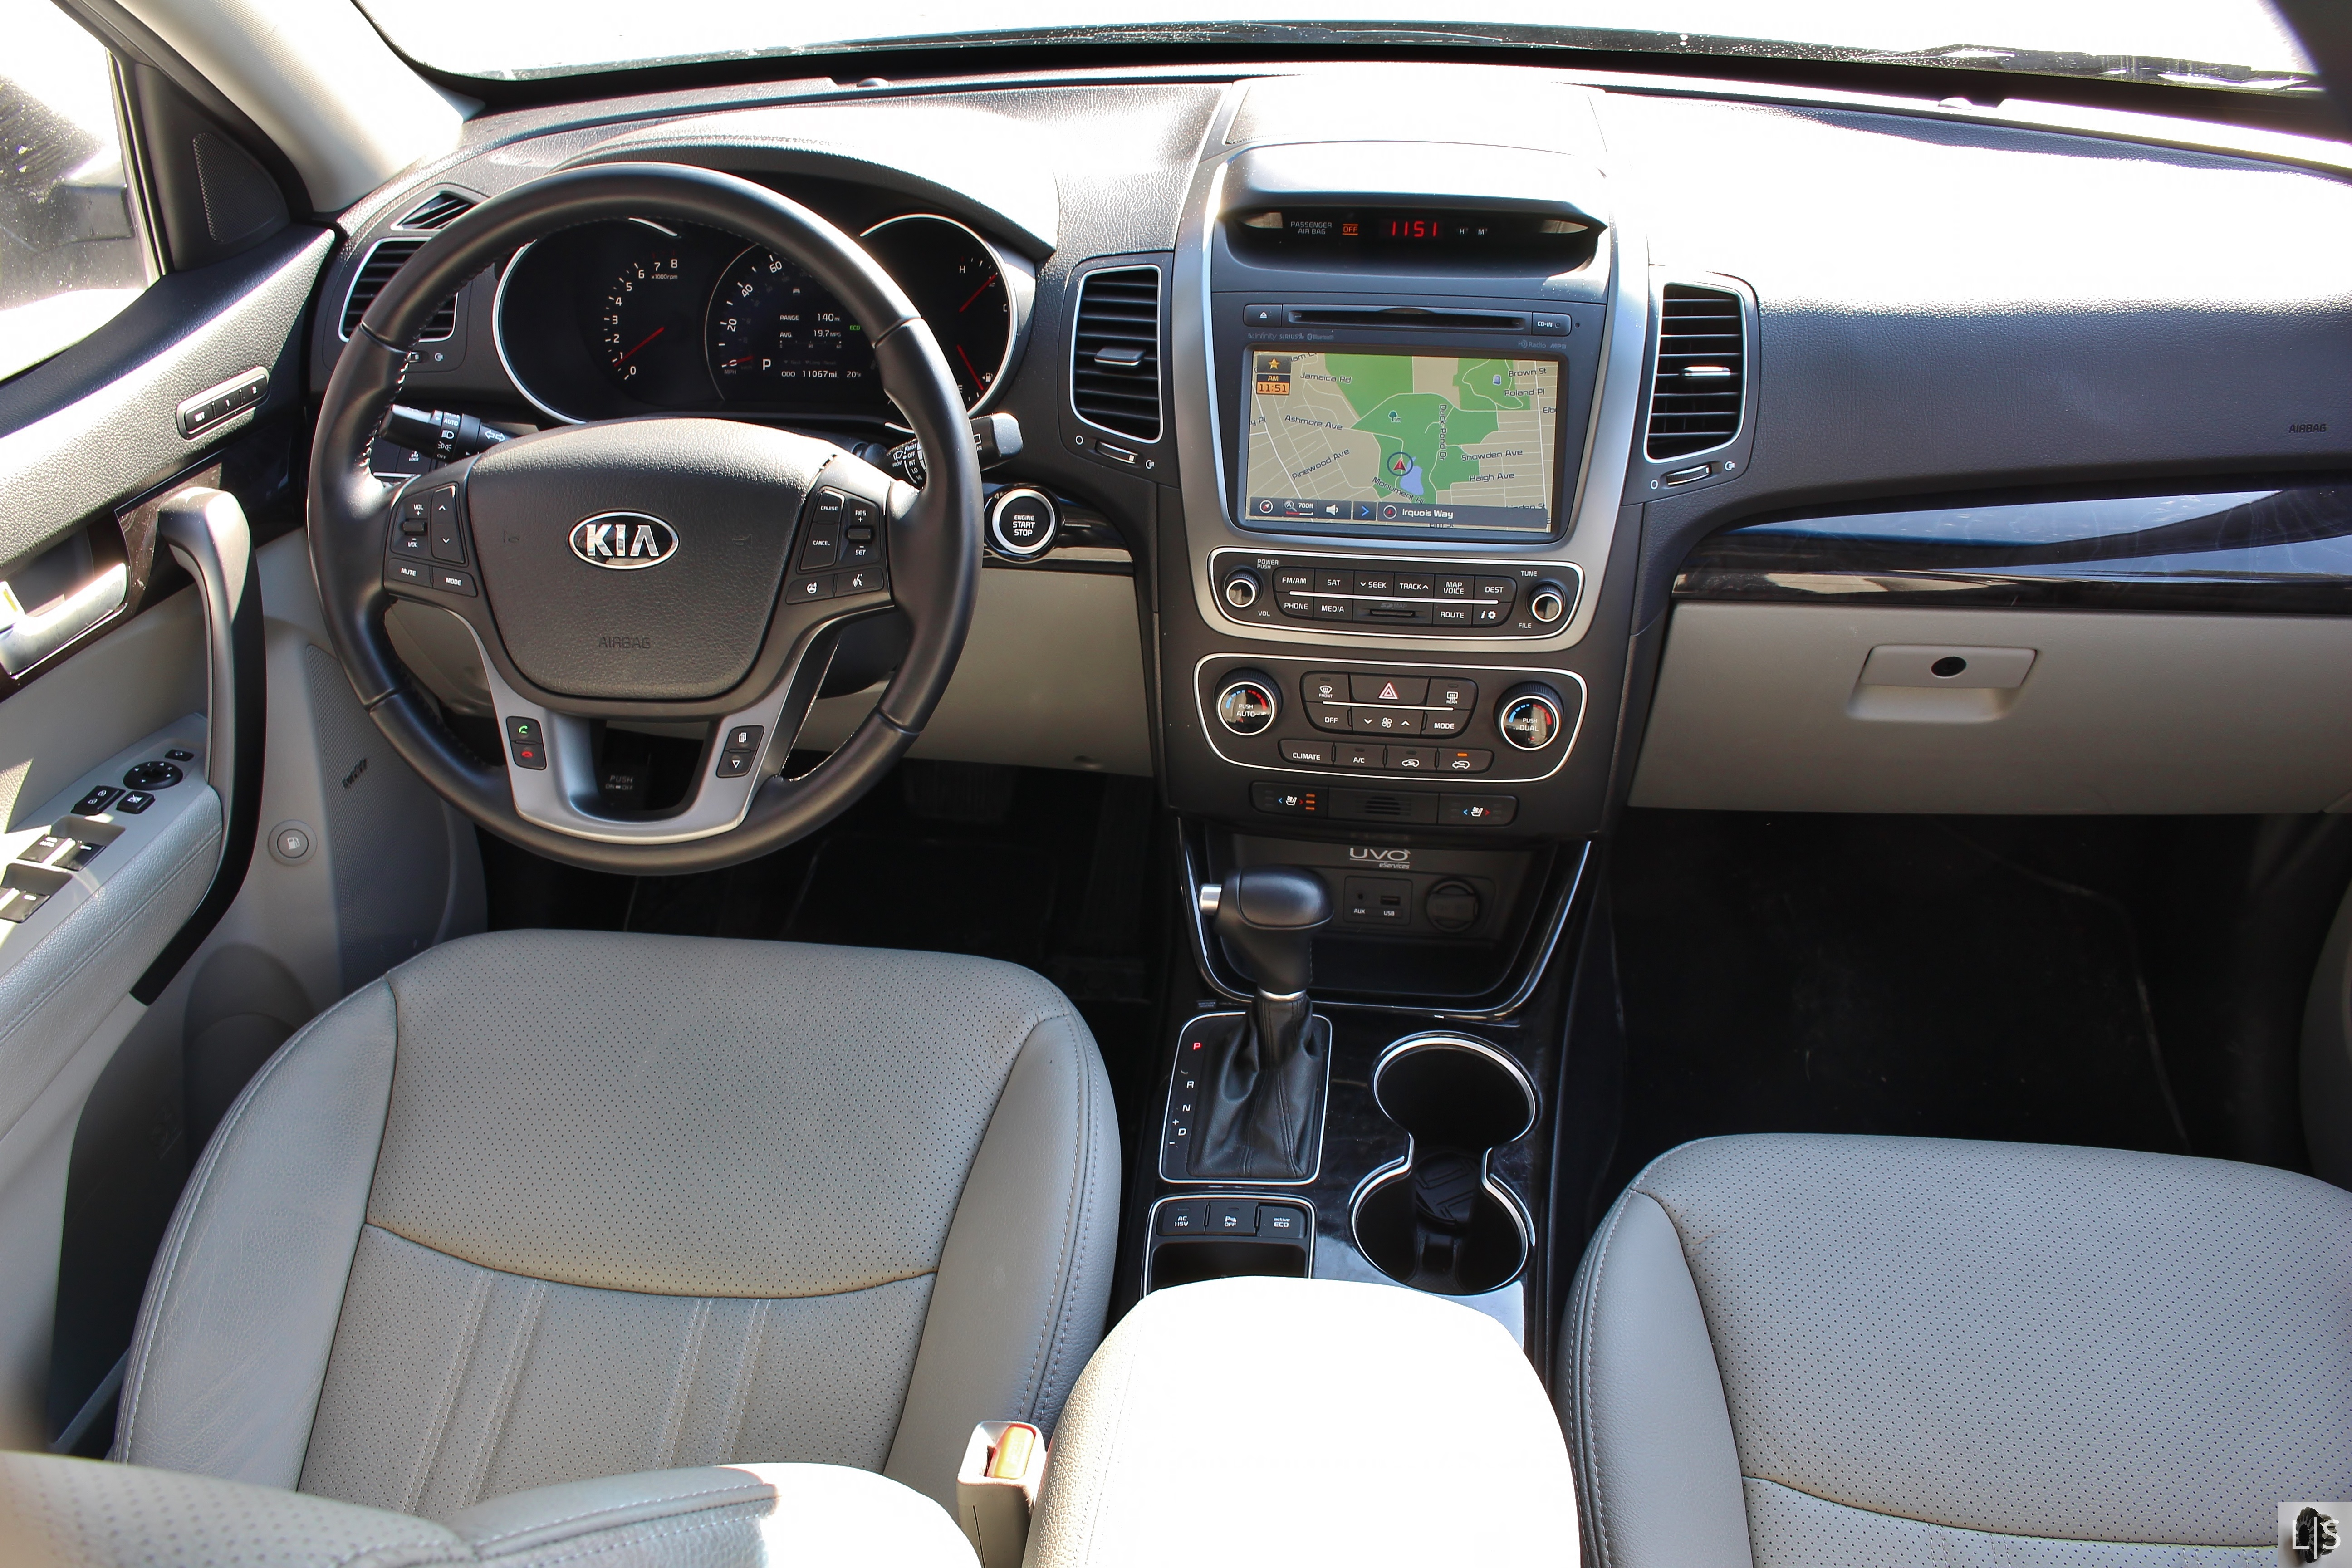 steering korean news of kia premiere interior ahead ex wheel suv sorento teased